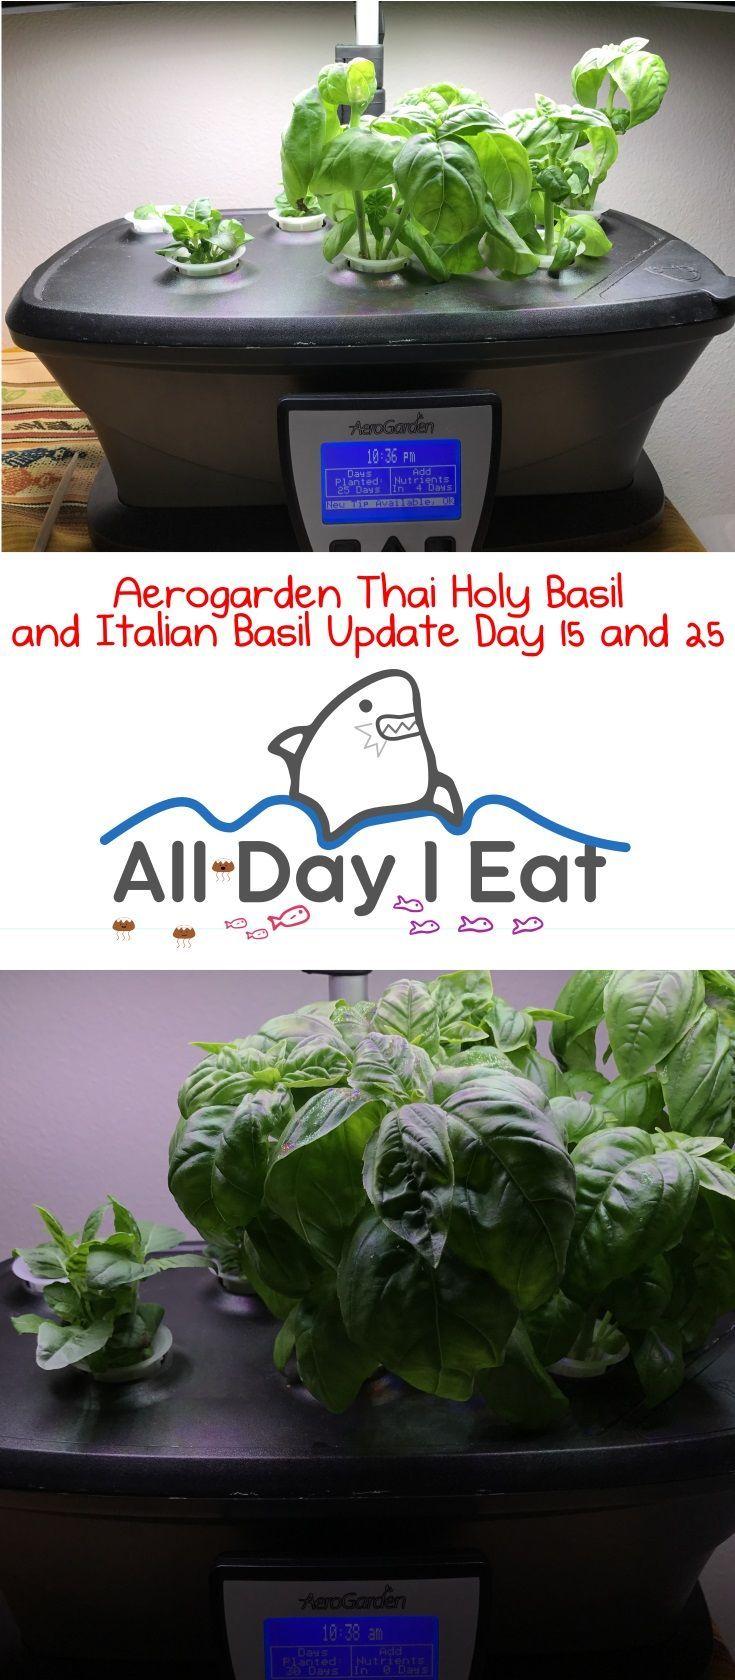 Aerogarden Thai Holy Basil And Italian Basil Update Day 15 400 x 300